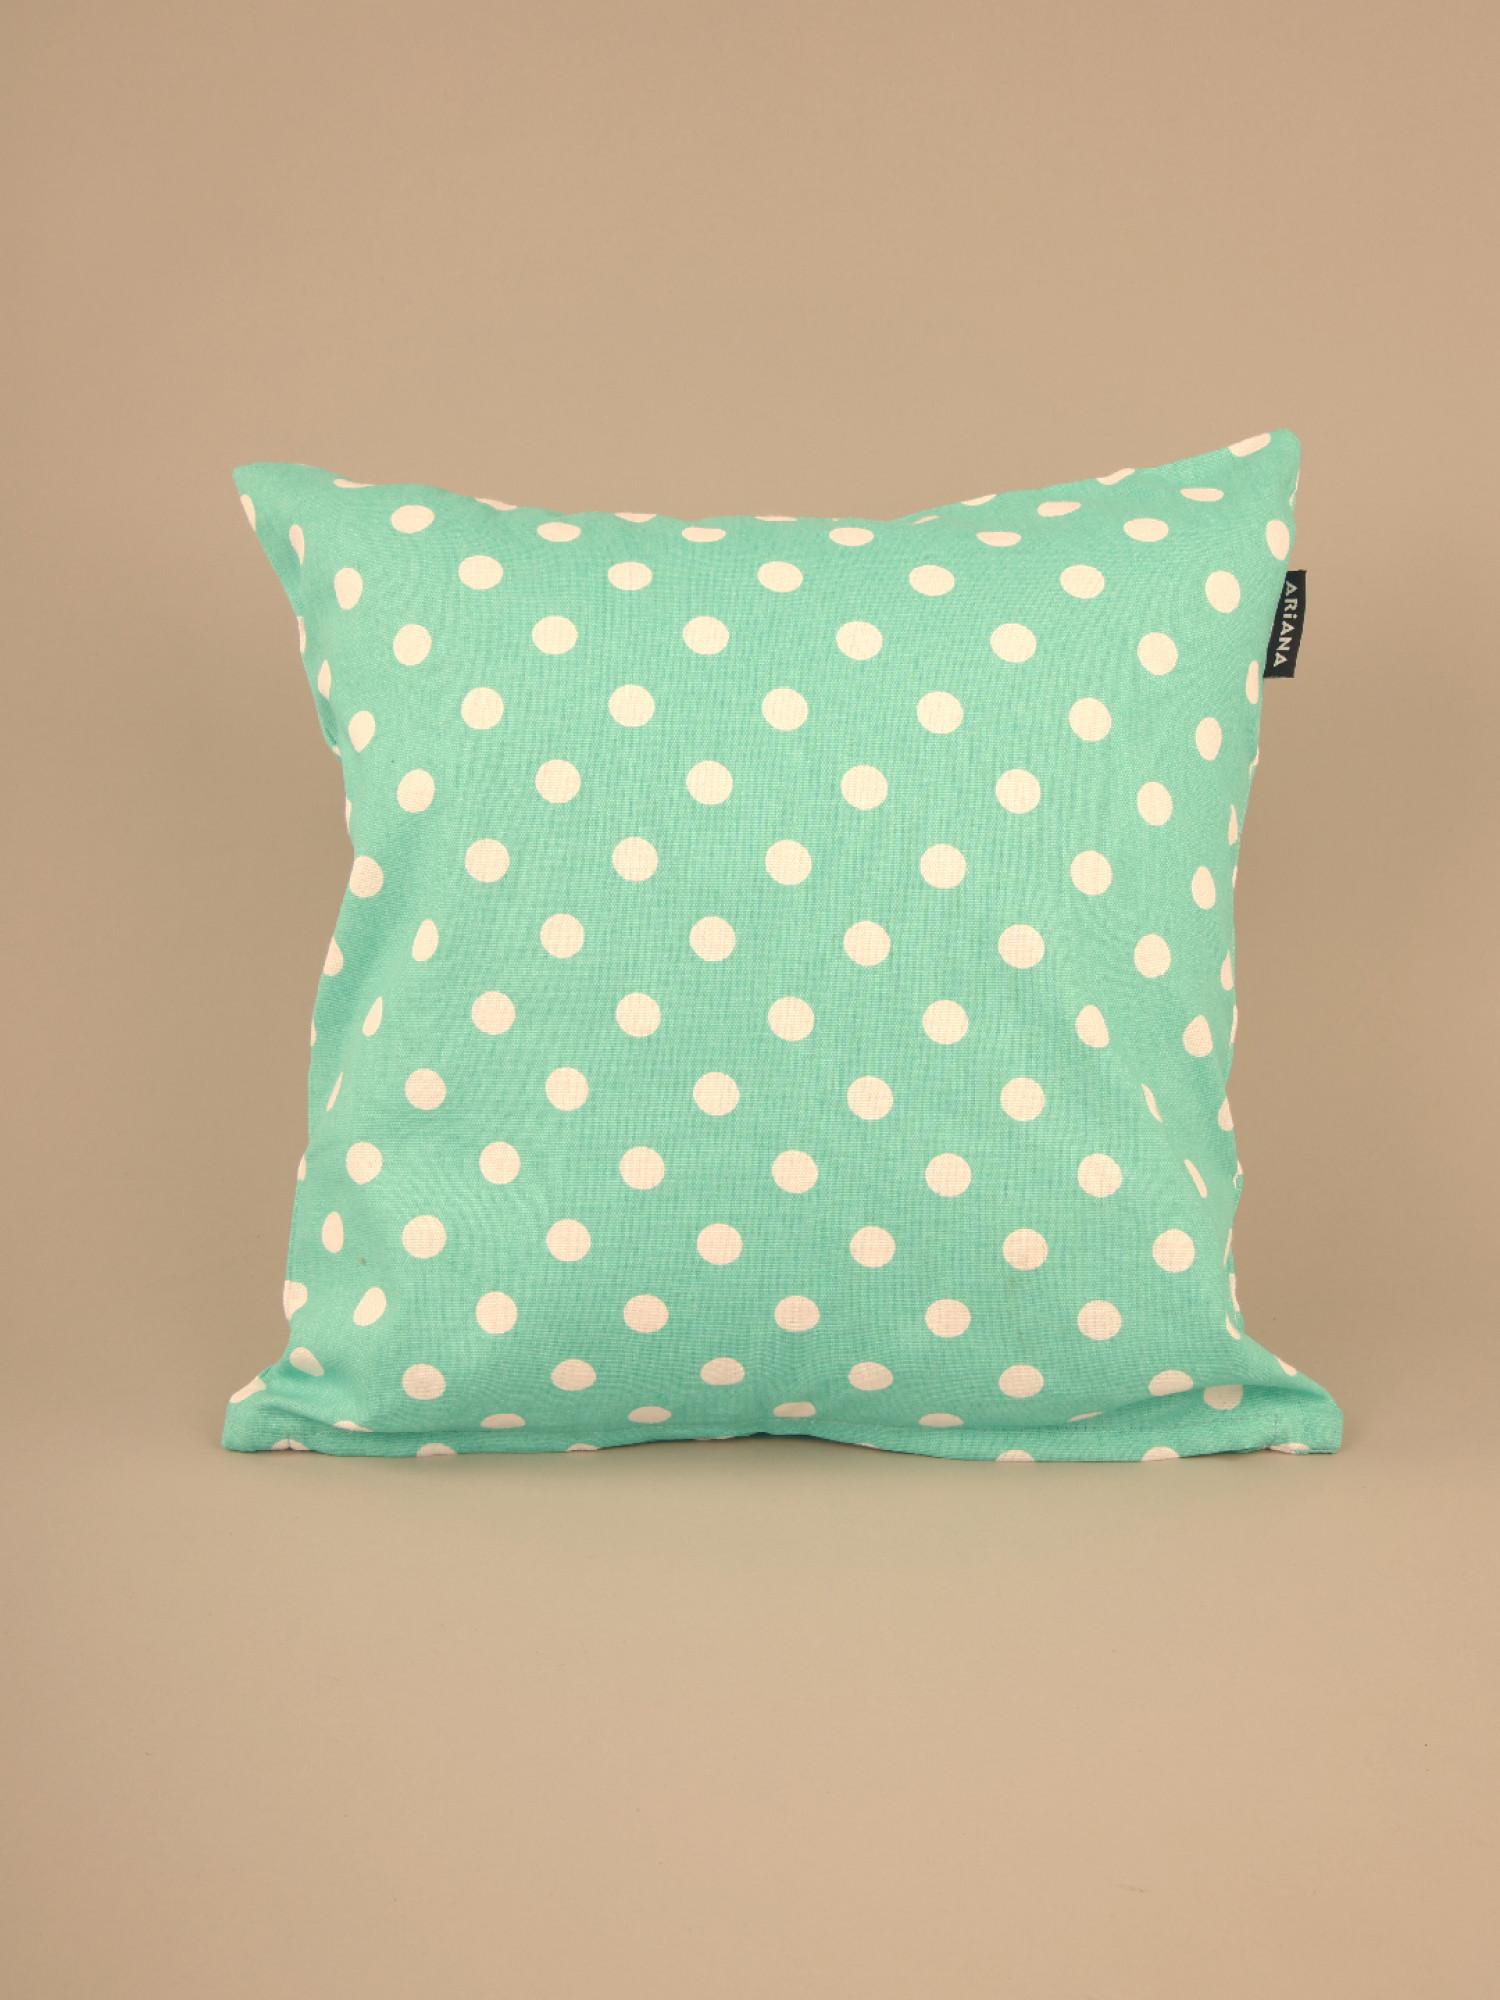 Polka Dot Cushion Cover